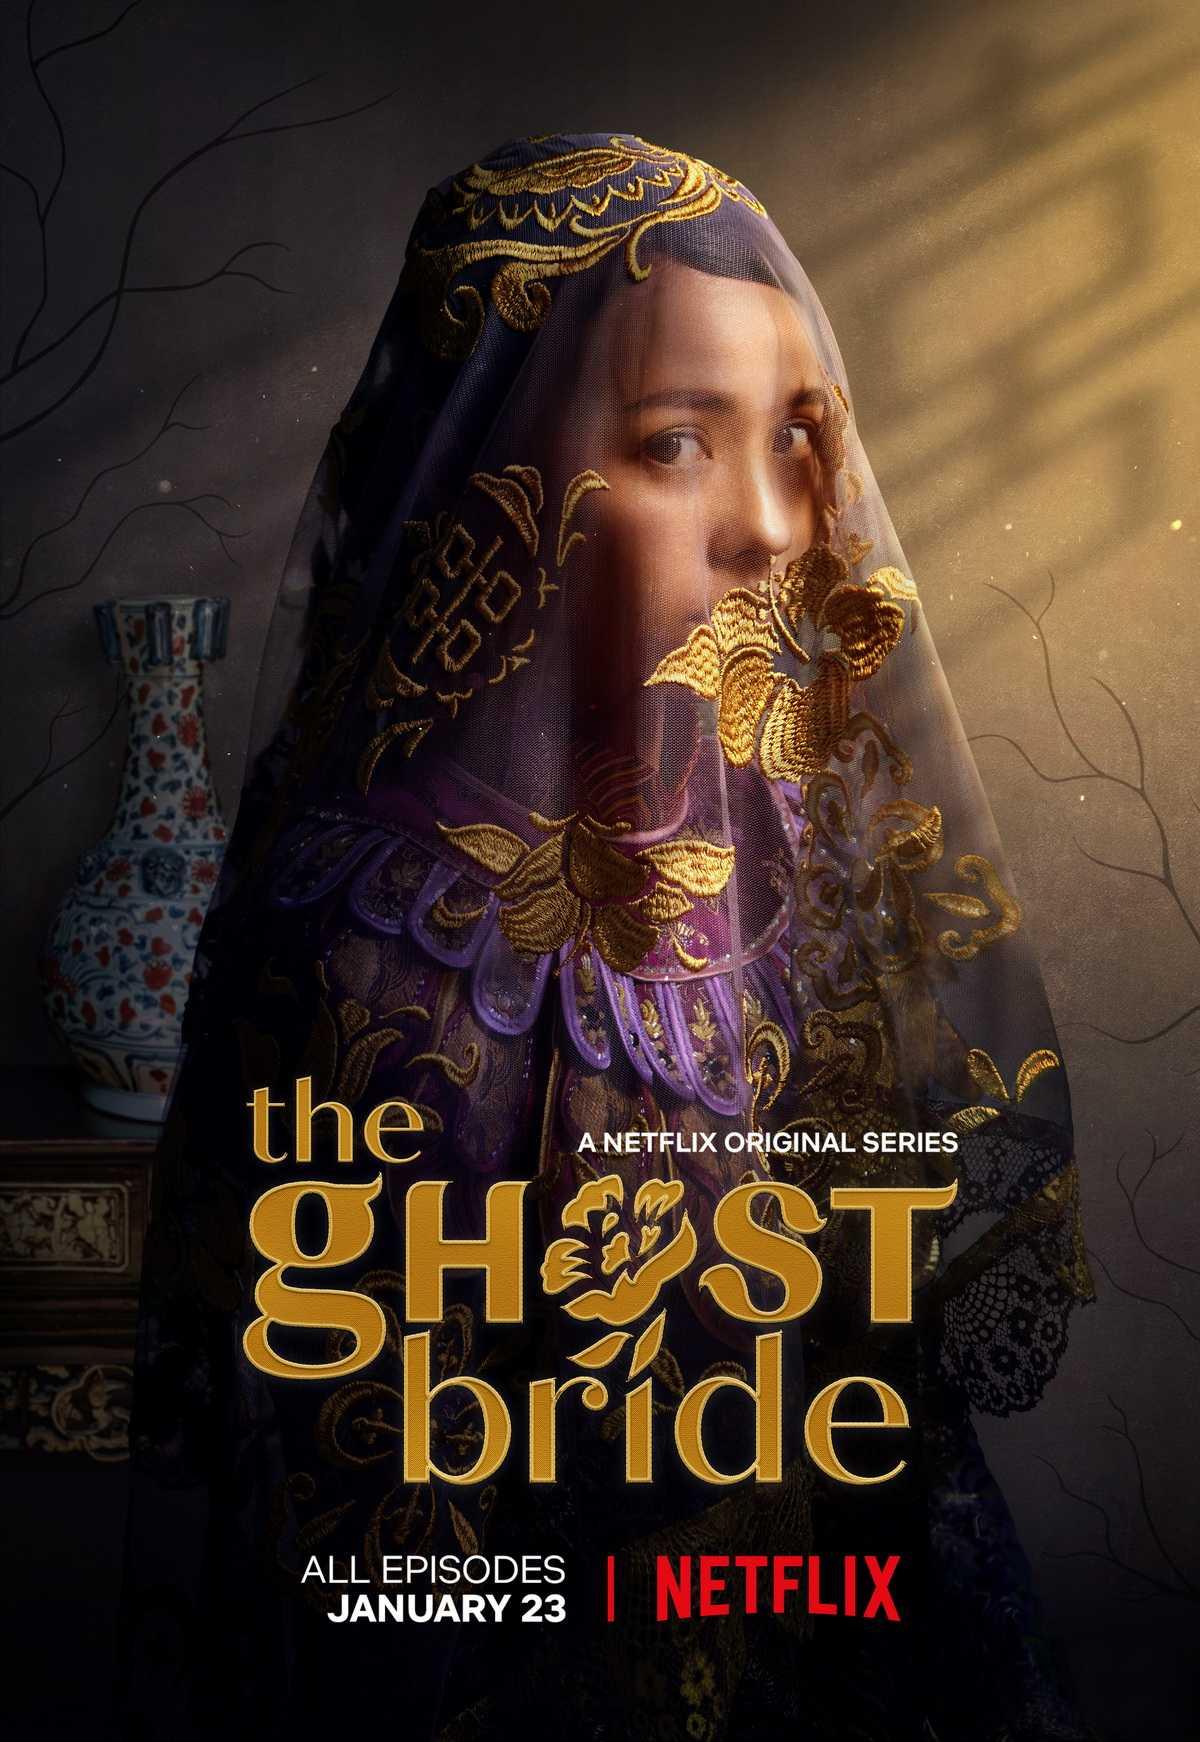 the-ghost-bride-เจ้าสาวเซ่นศพ-ตอนที่-1-6-พากย์ไทย-จบ-